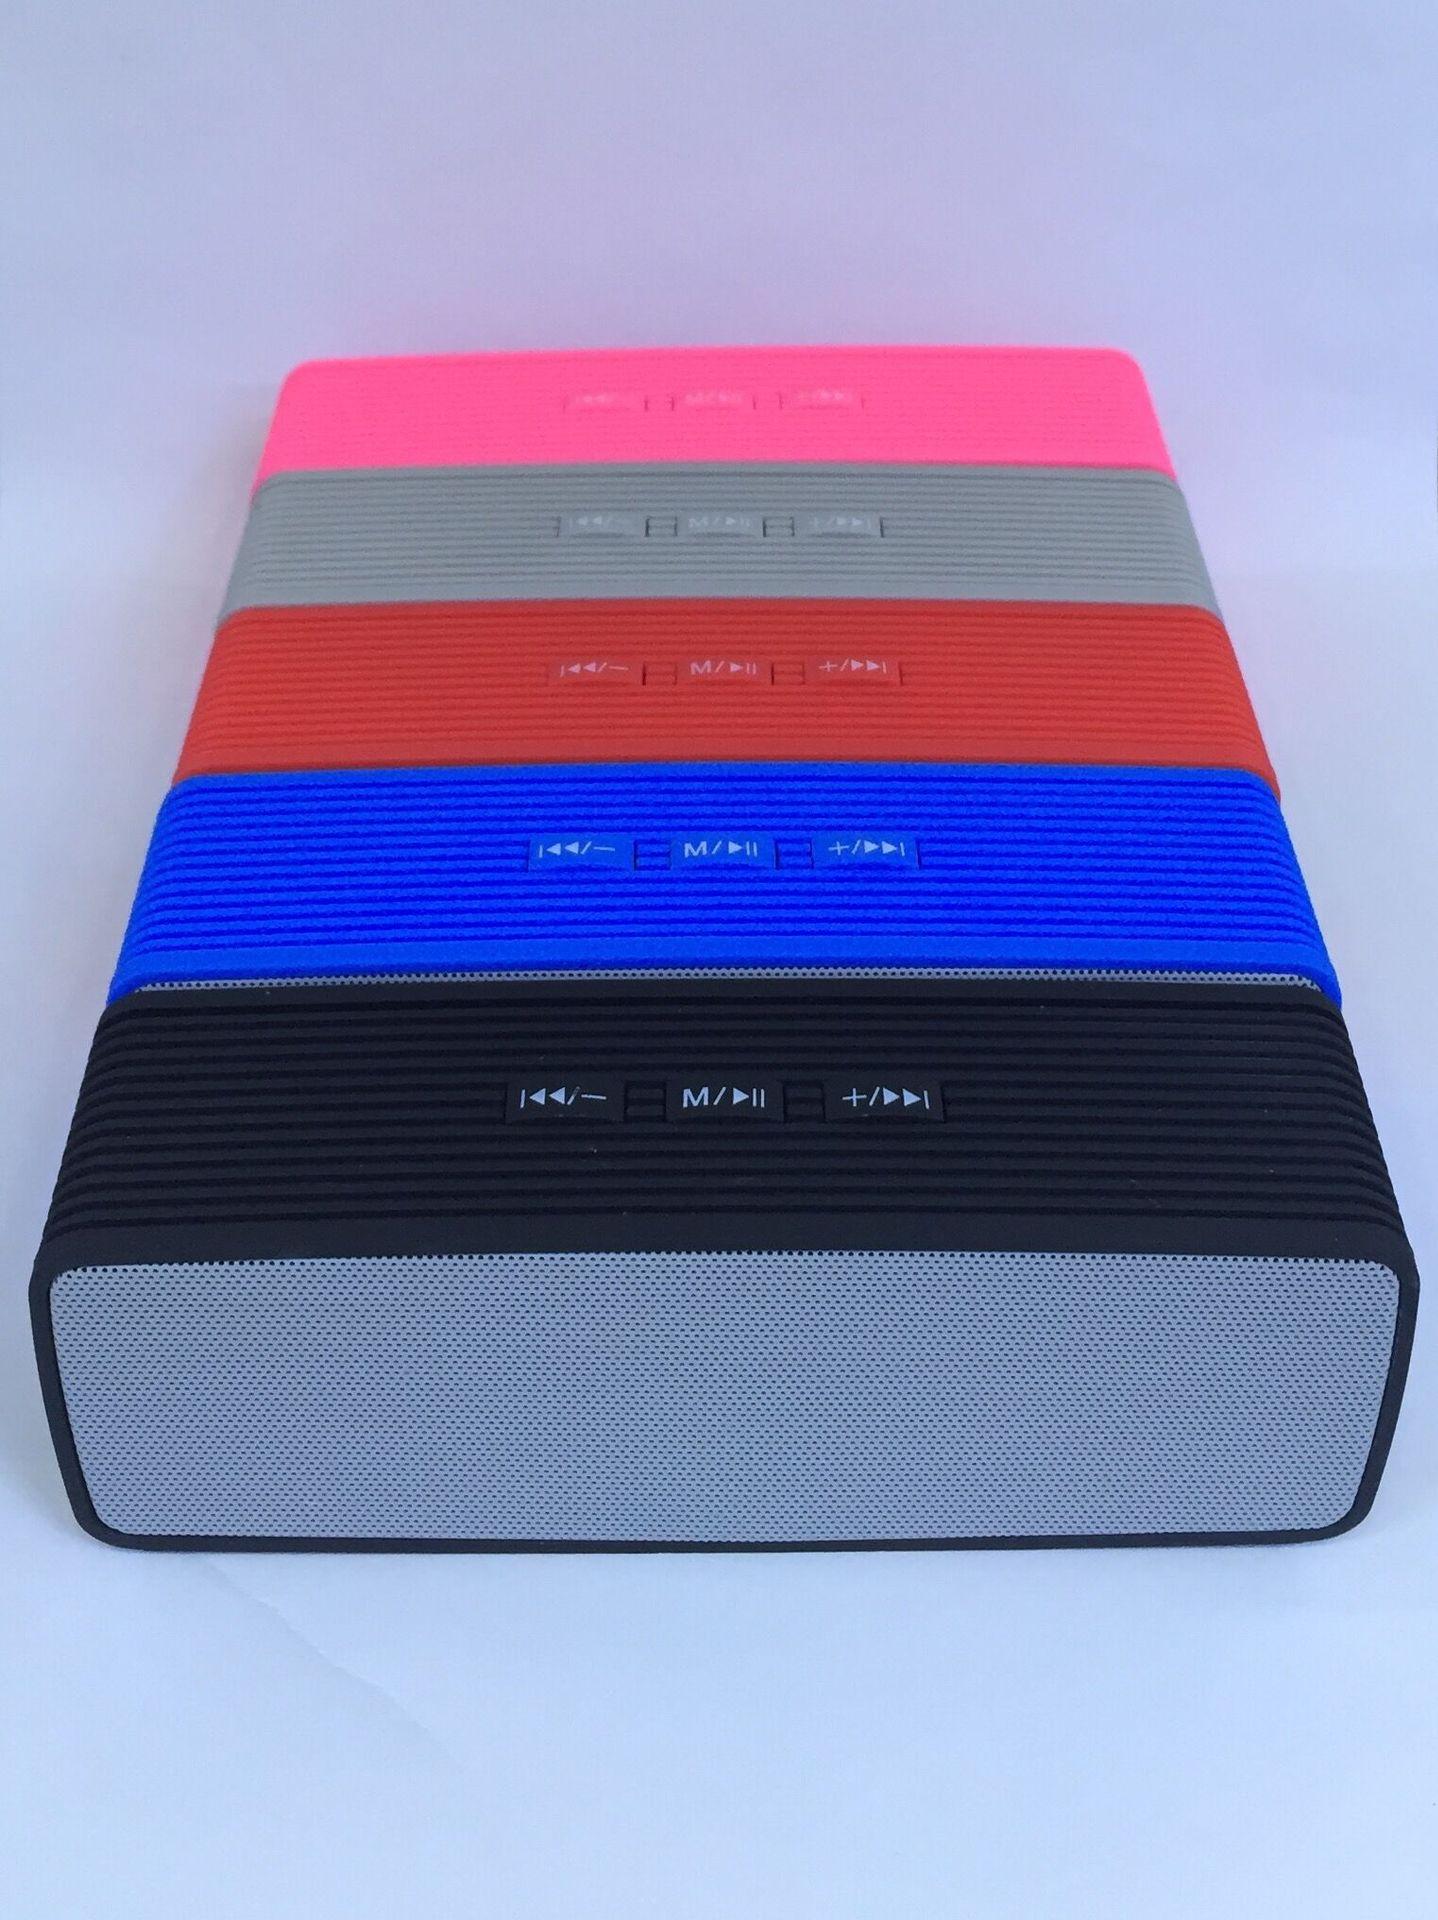 Dr. B3 three generation Bluetooth speaker outdoor sports portable mini sound USBTF bass subwoofer gi